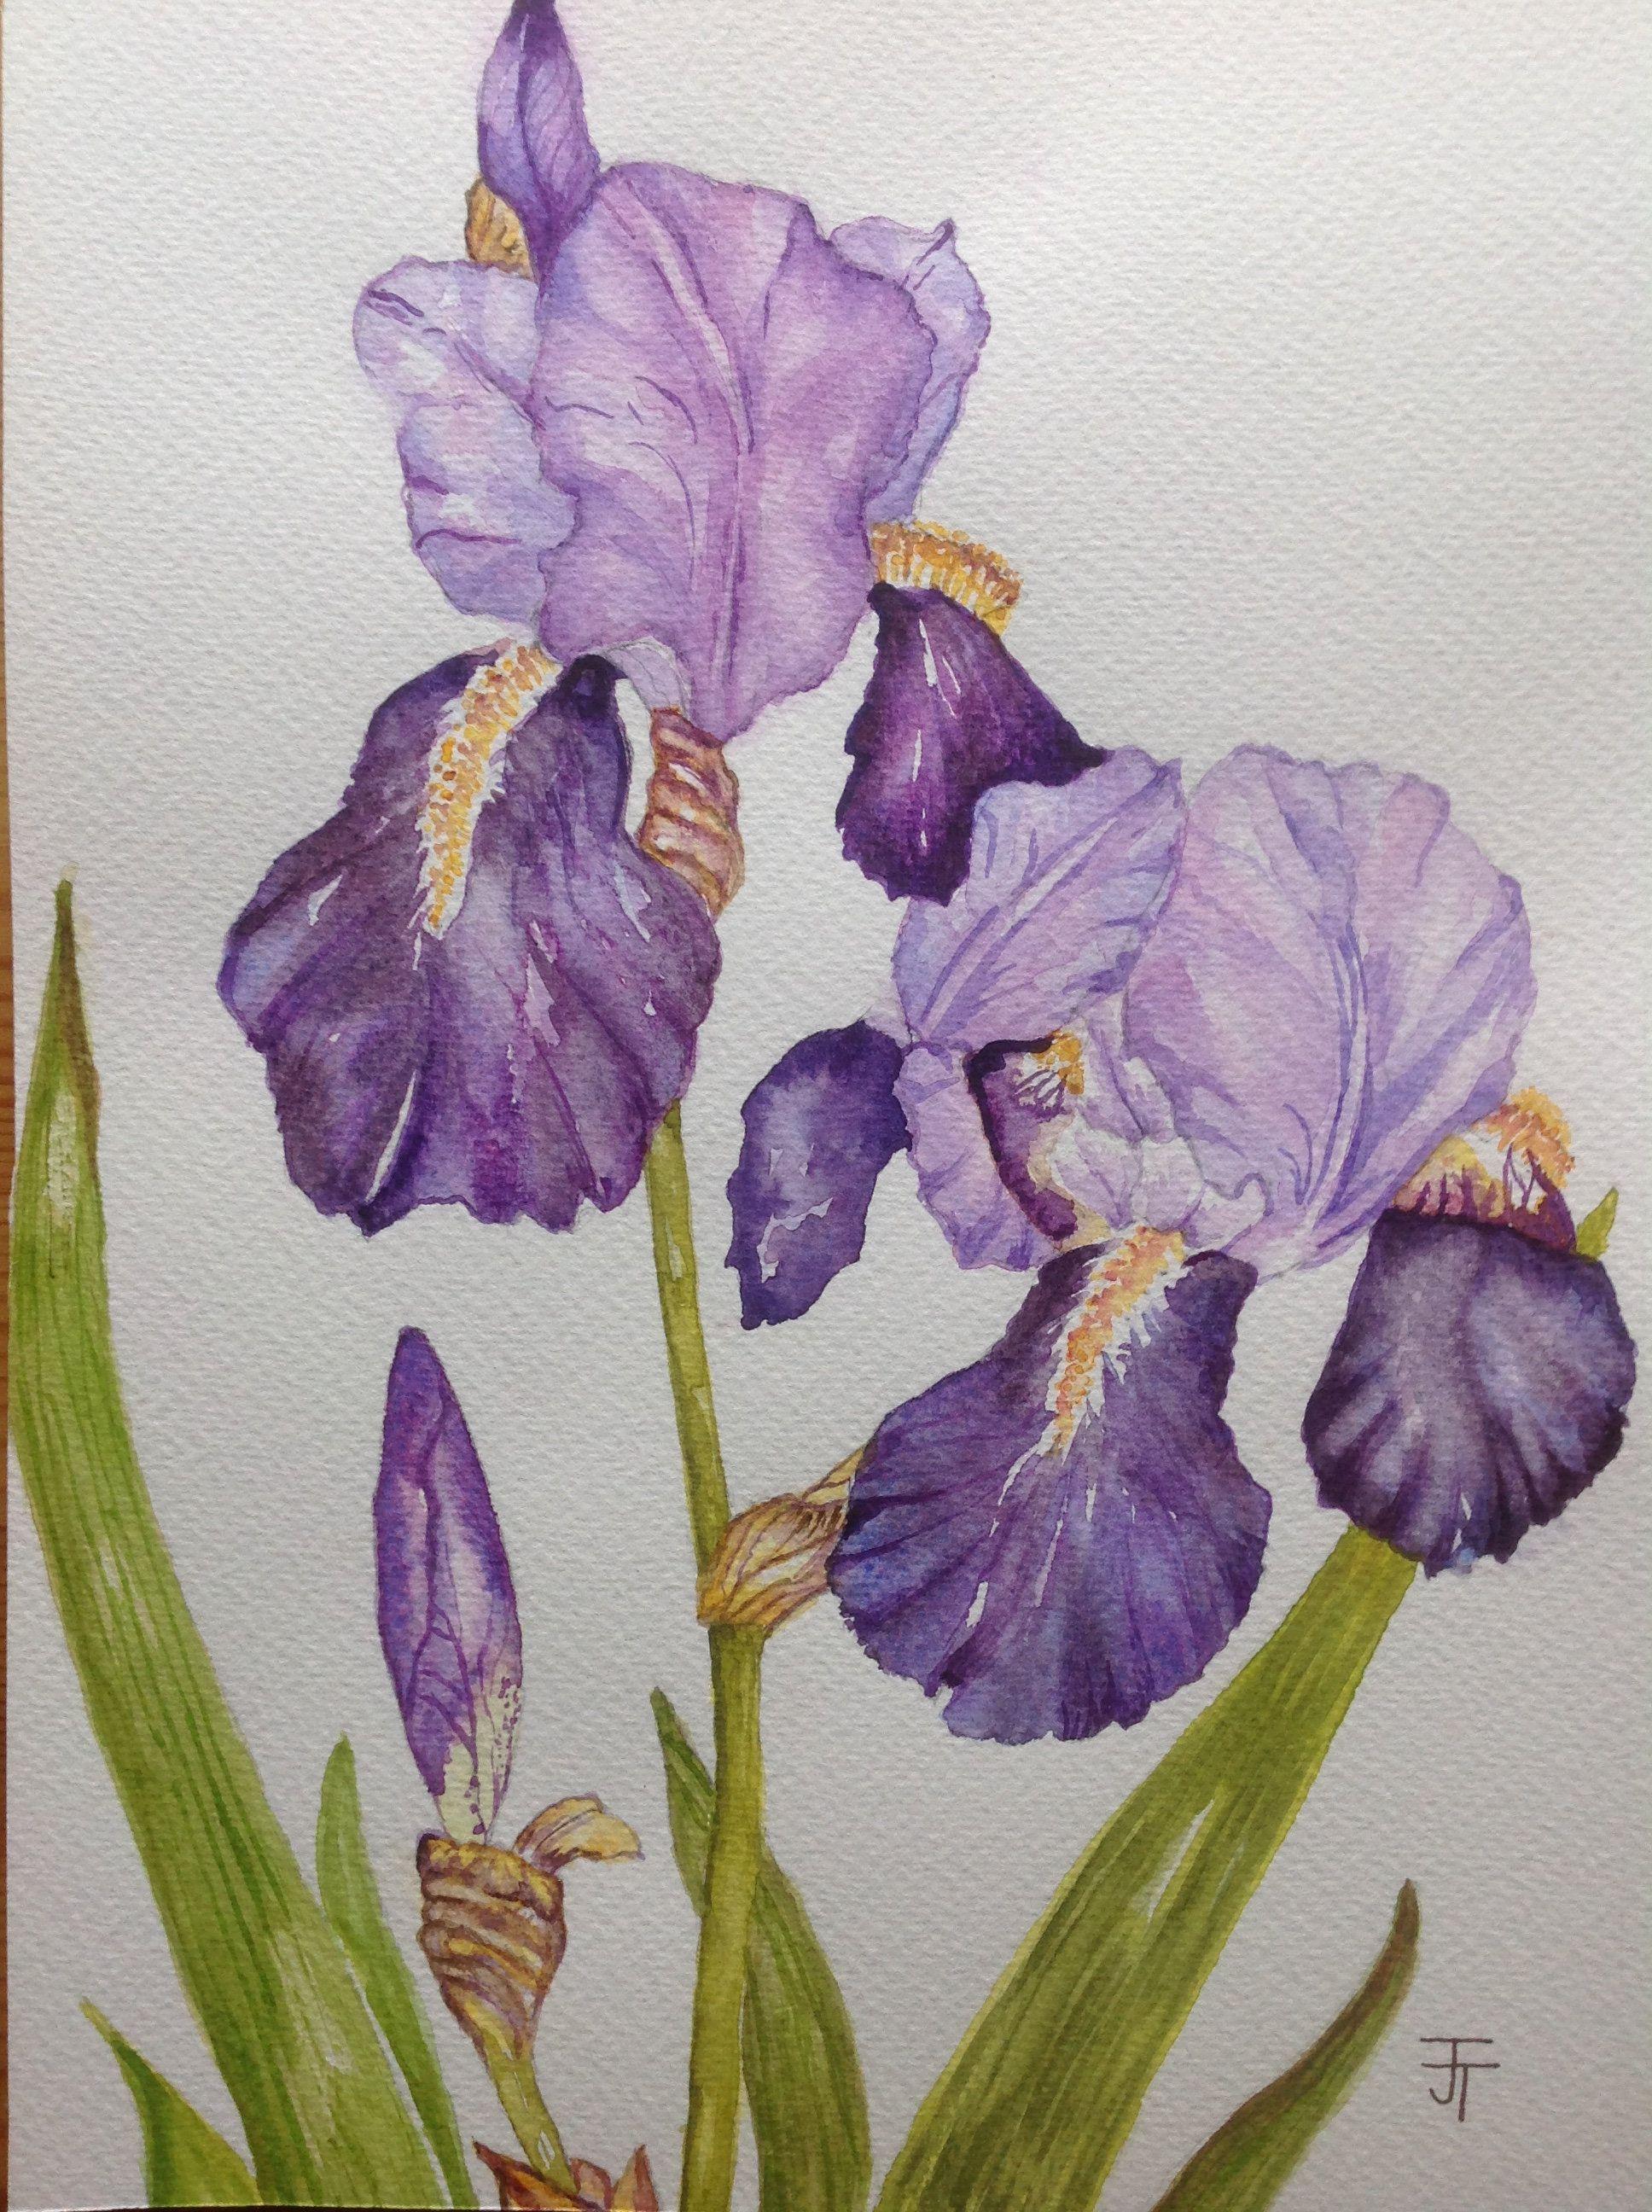 Watercolour Painting Purple Iris Watercolour Flowers Watercolour Iris Wall Art Home Decor Iris Painting In 2020 Iris Painting Flower Painting Watercolor Flowers